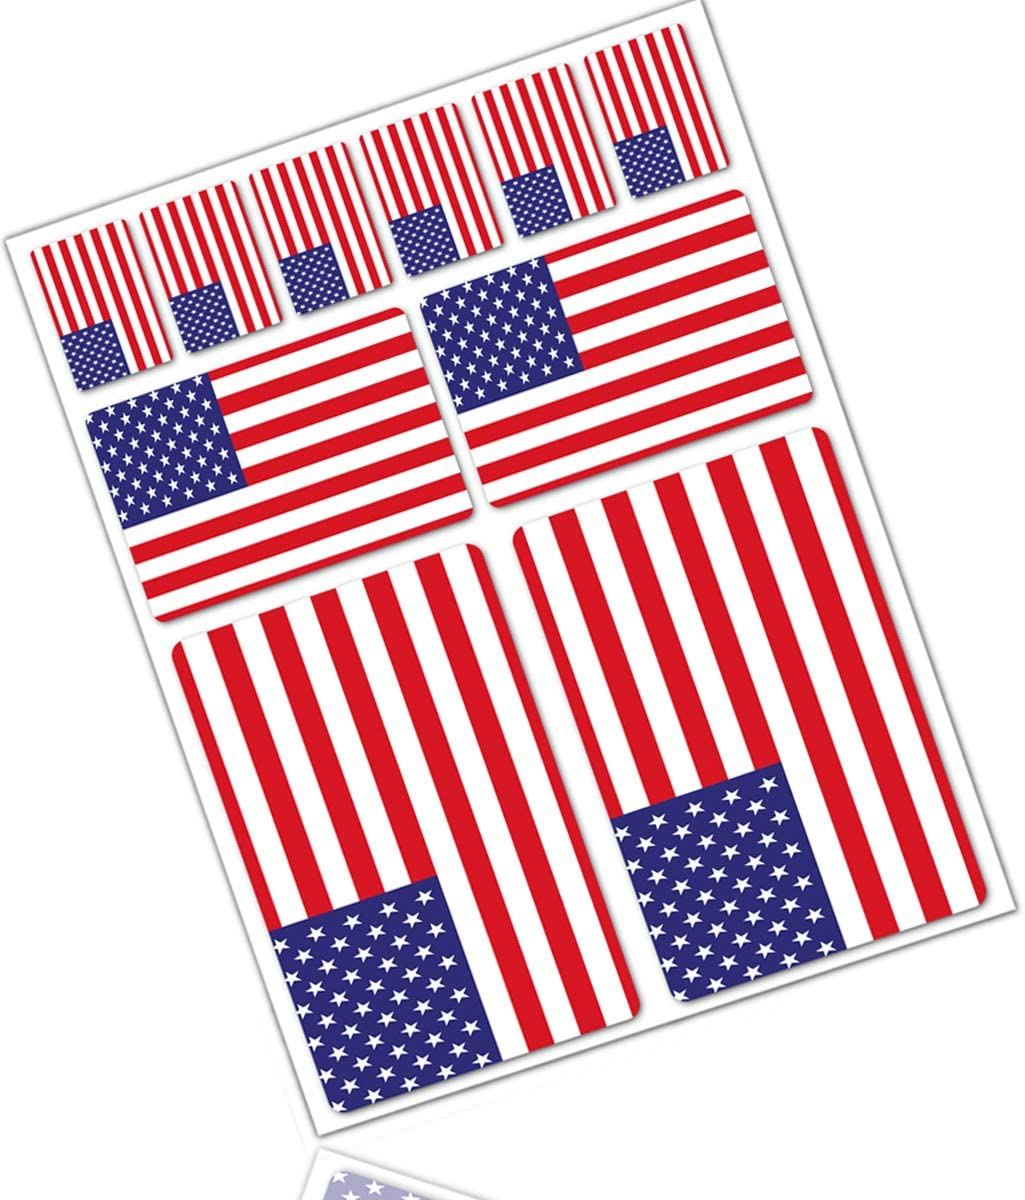 Biomar Labs 10 X Vinyl Aufkleber Autoaufkleber Stickers Fahne Flagge Usa Amerika America Amerikanische Auto Moto Motorrad Fahrrad Scooter Fenster D 39 Auto